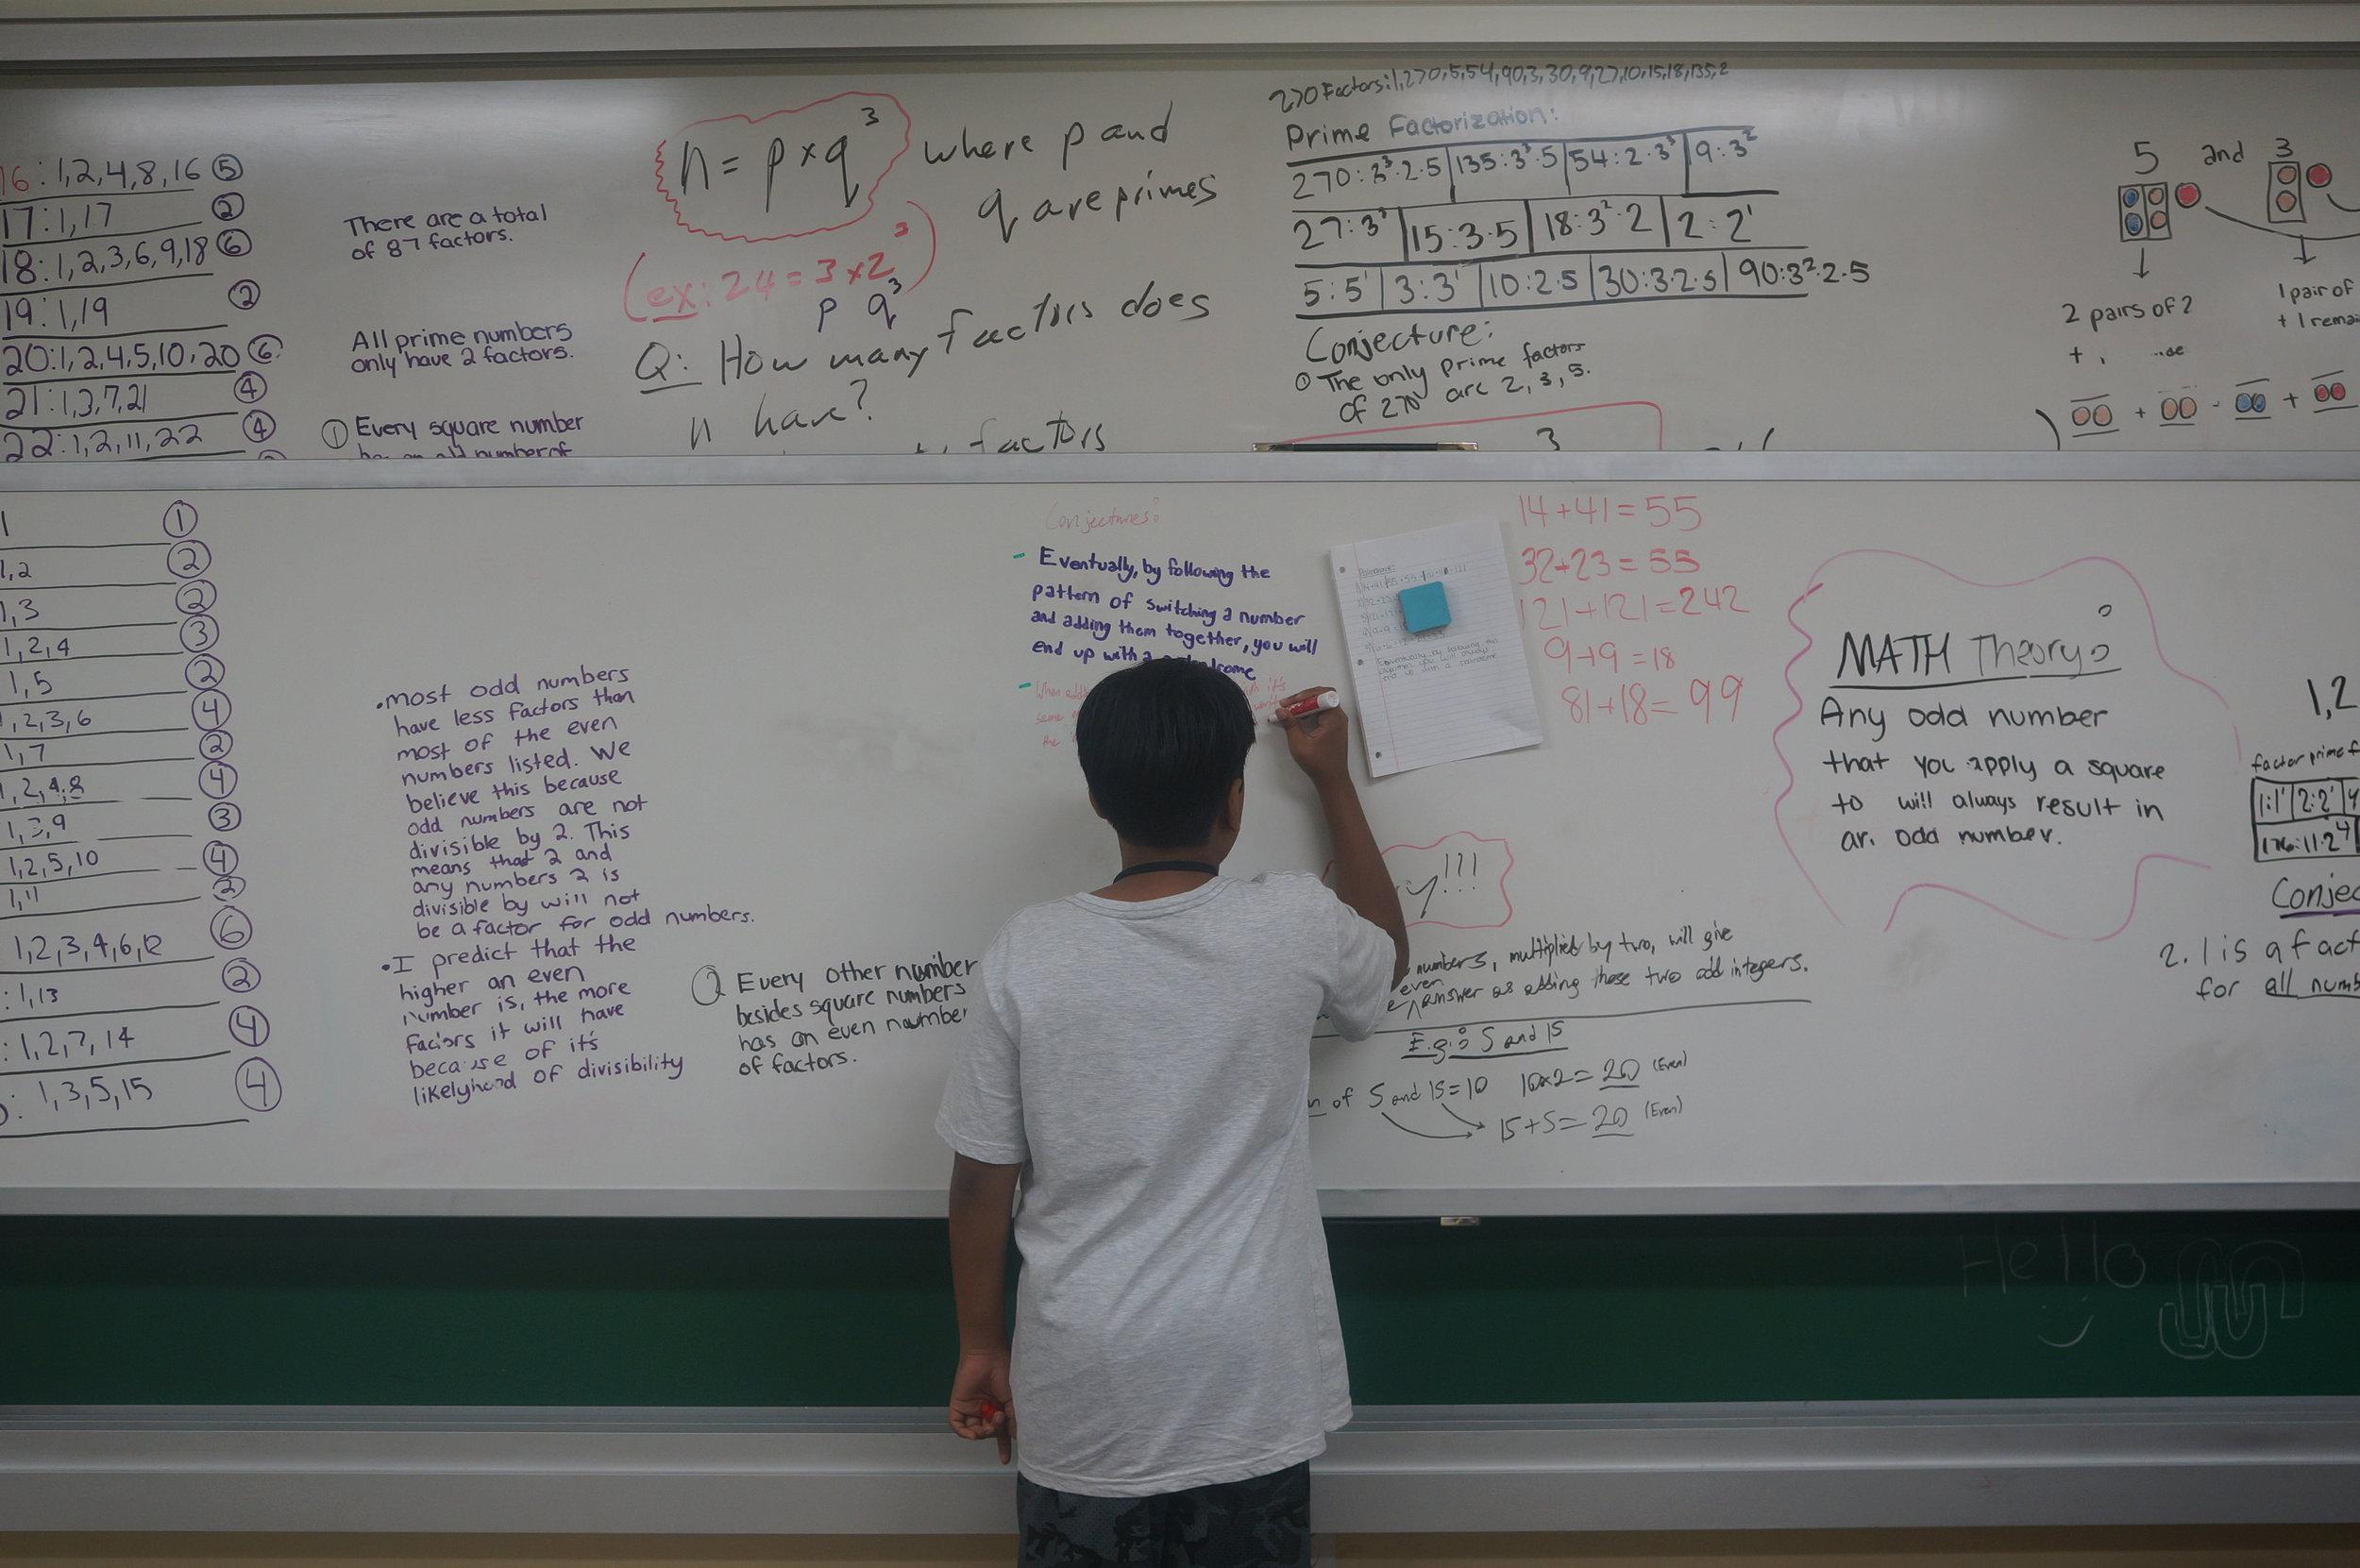 What is new at BEAM? — Bridge to Enter Advanced Mathematics